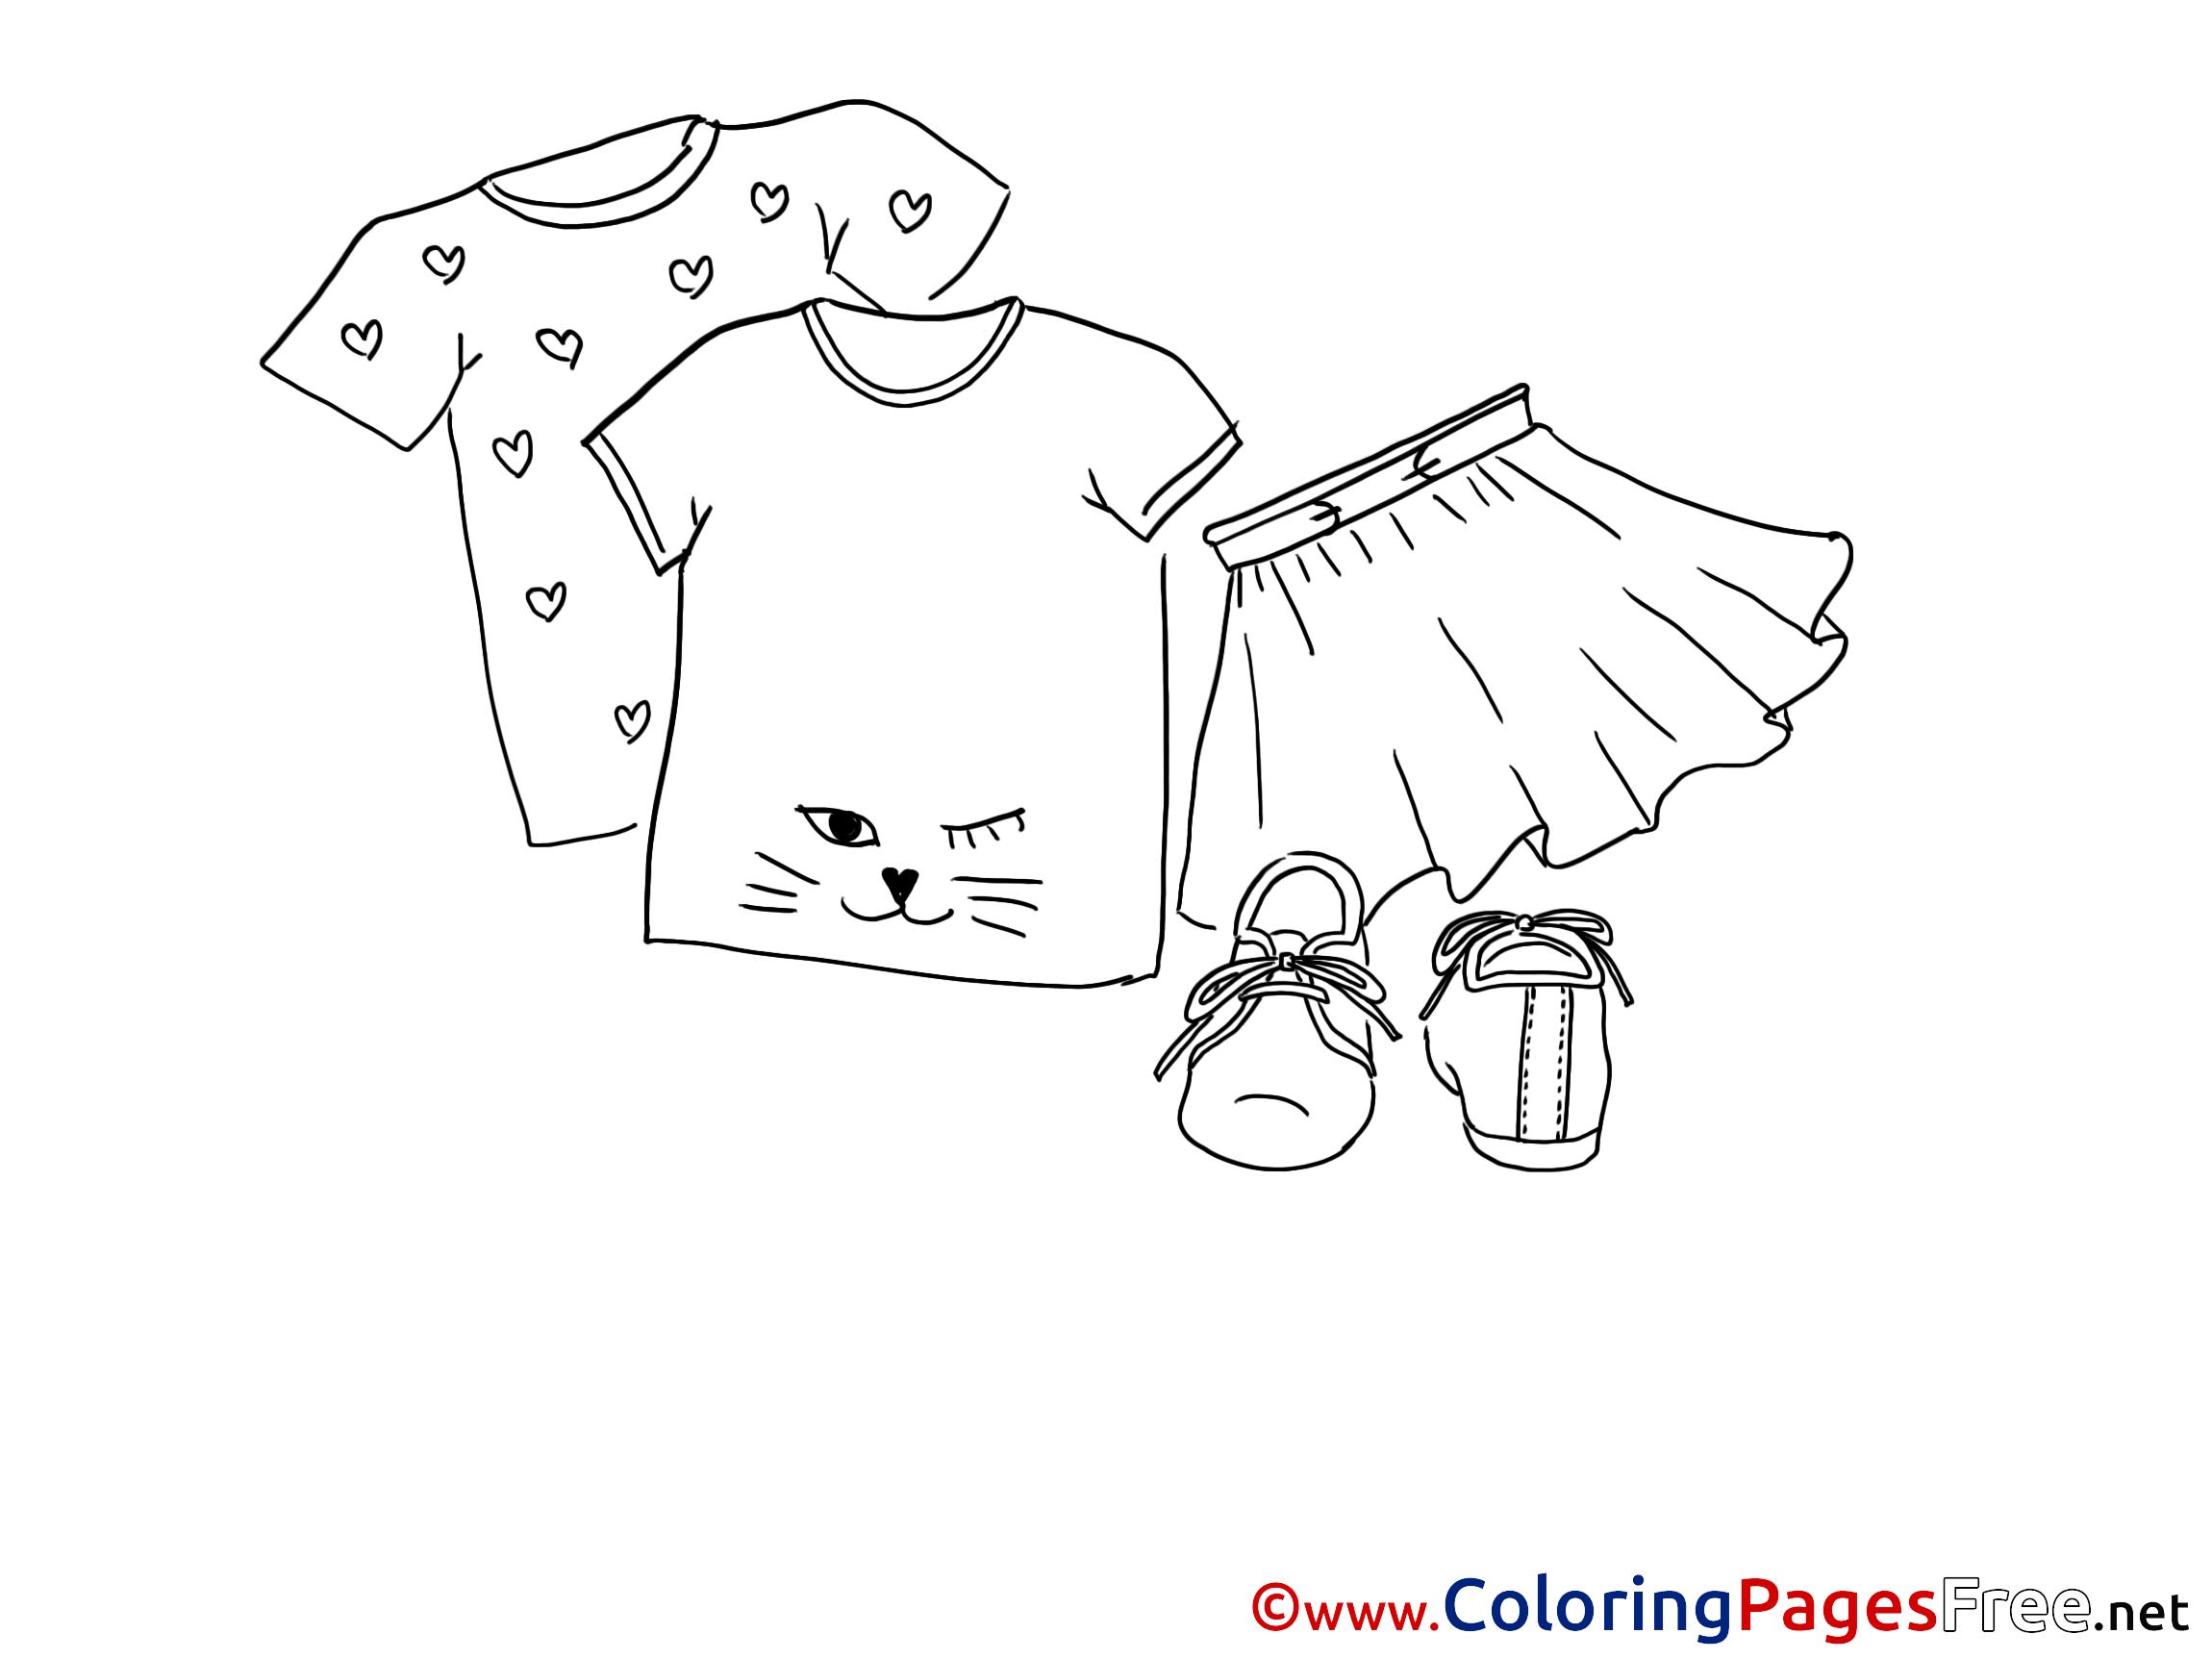 T shirt coloring pages - T Shirt Coloring Pages 46